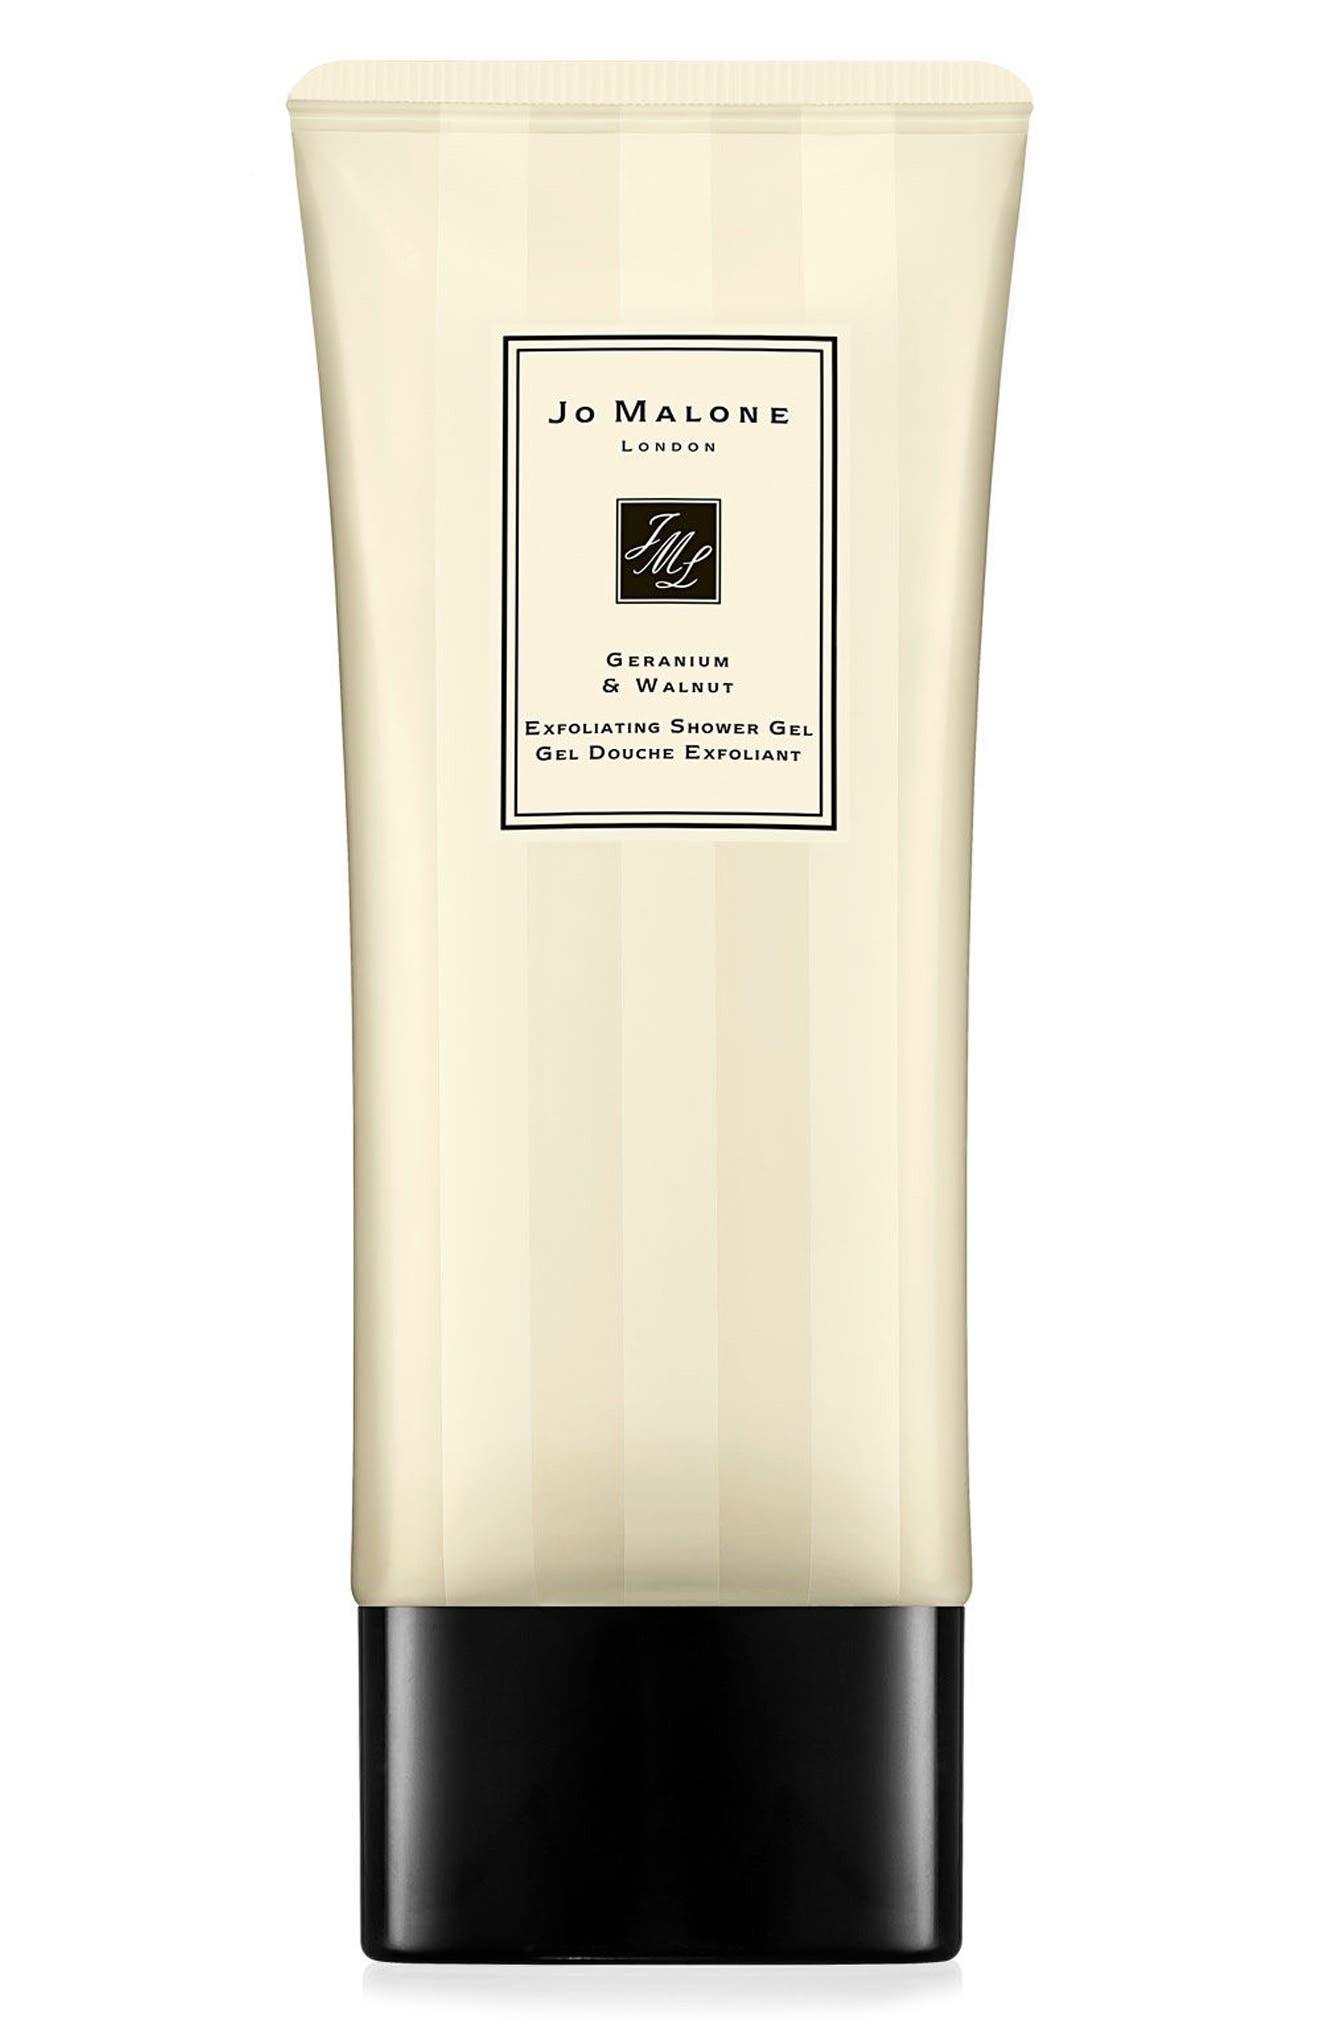 Jo Malone London™ Geranium & Walnut Exfoliating Shower Gel